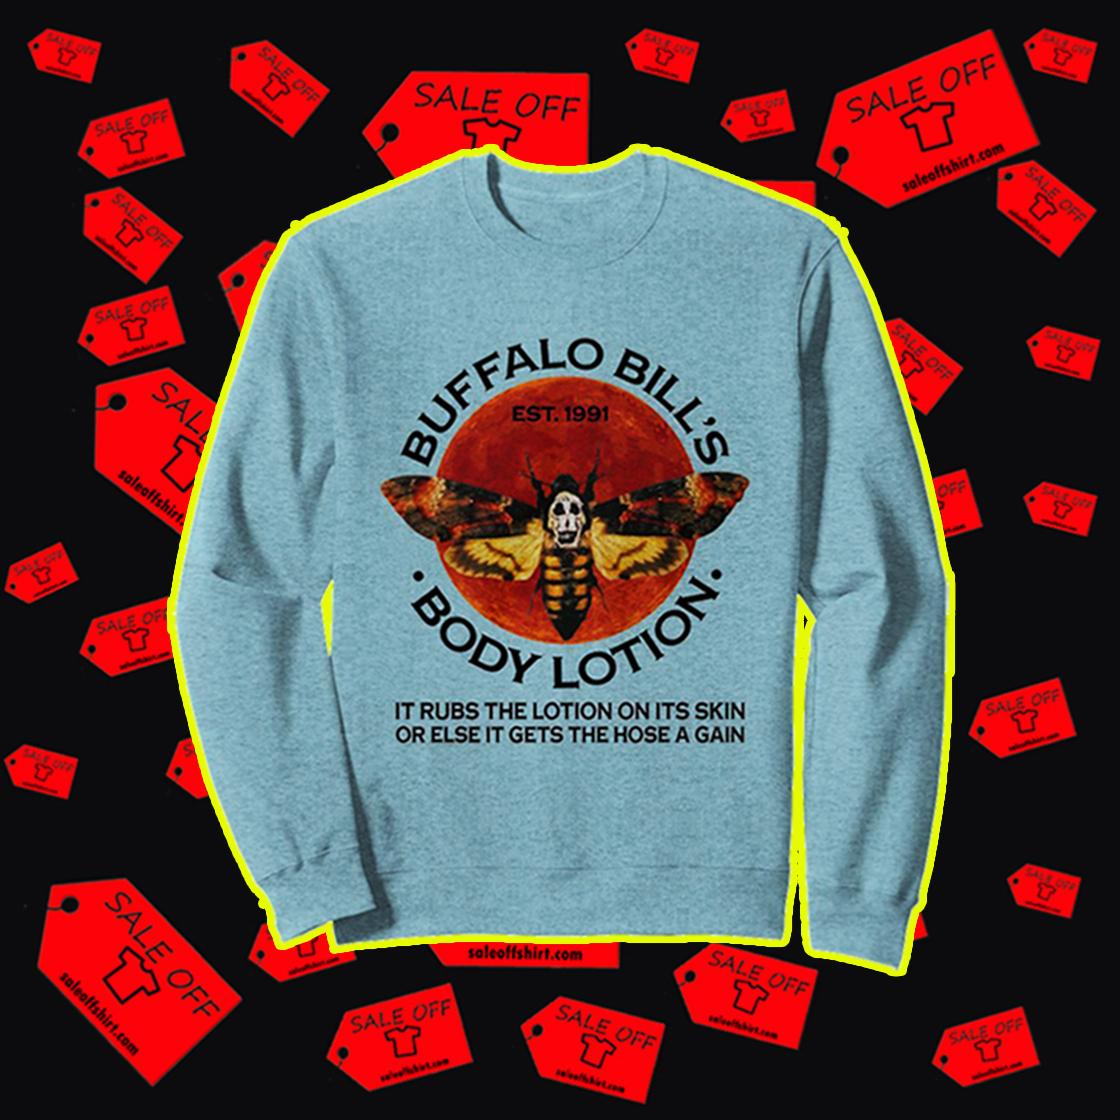 Buffalo bill's body lotion sweatshirt